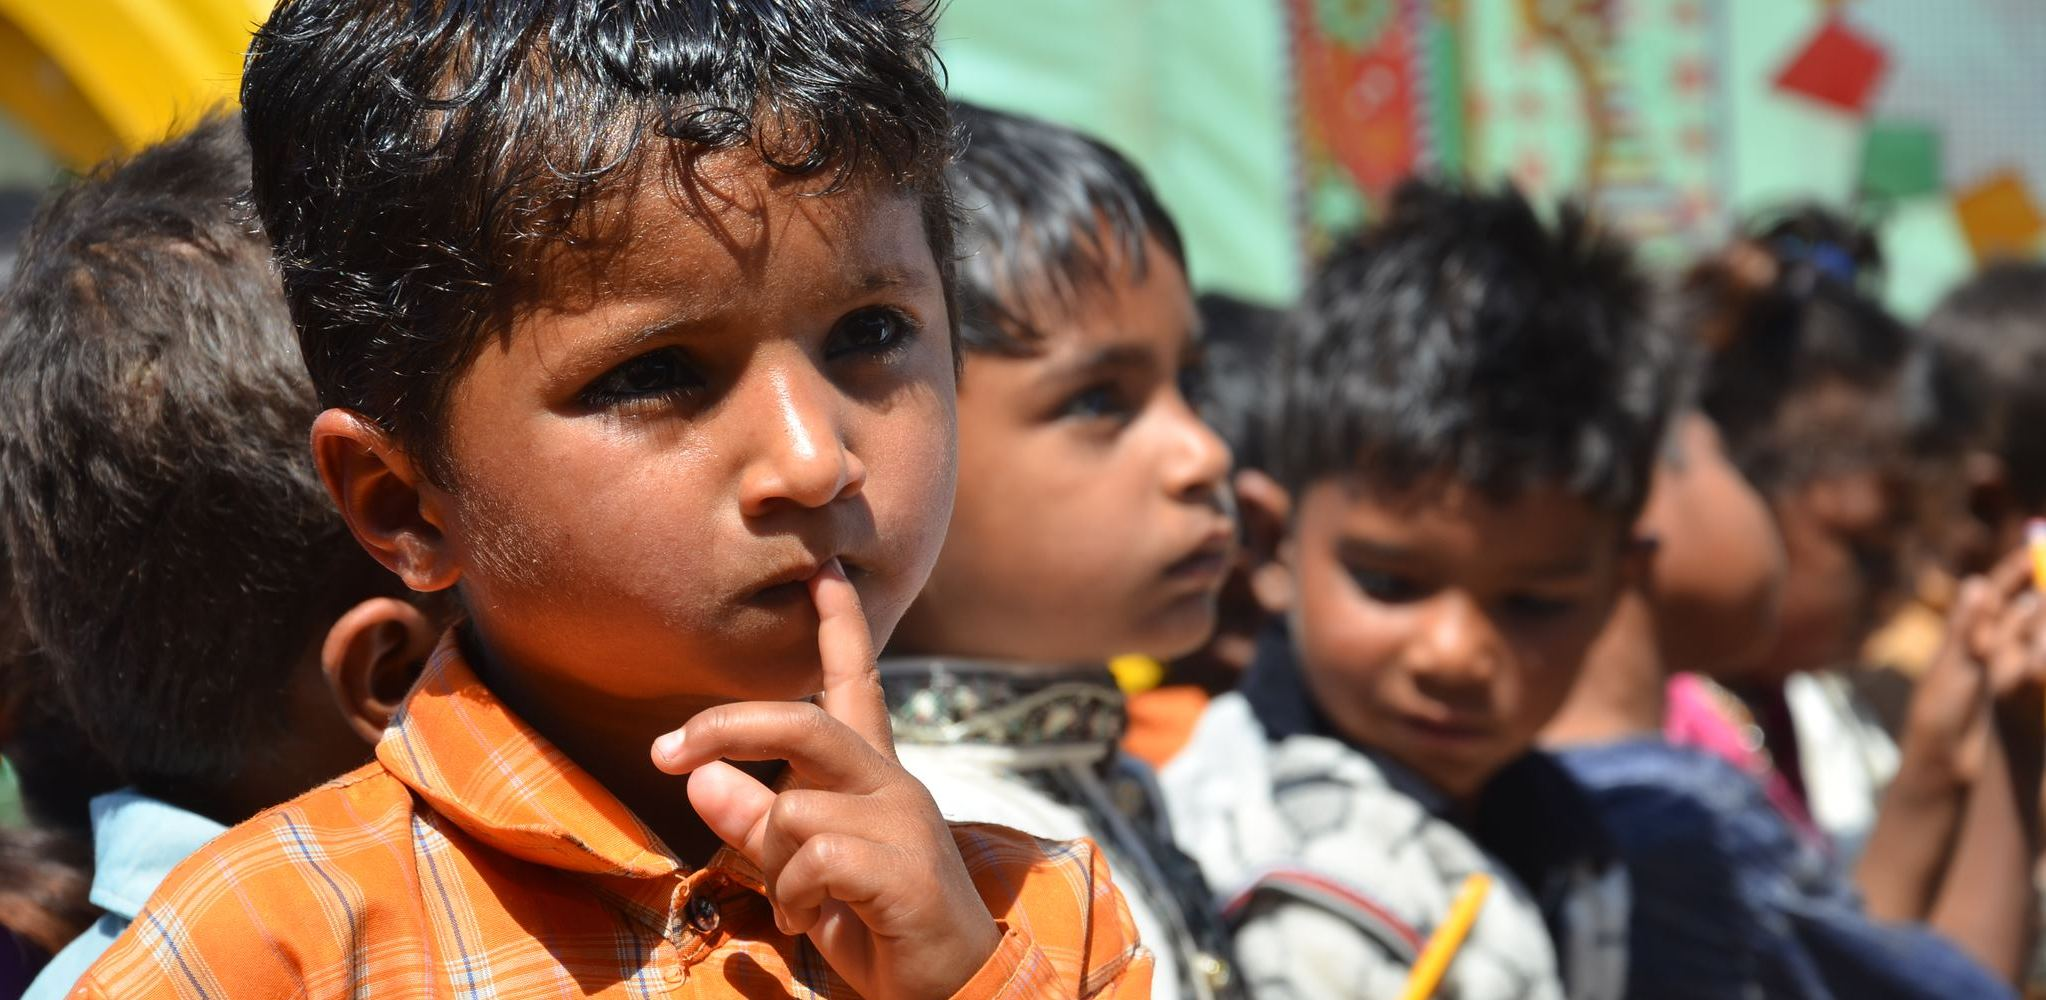 Bunyad Foundation, Shaheen Attiq ur Rehman